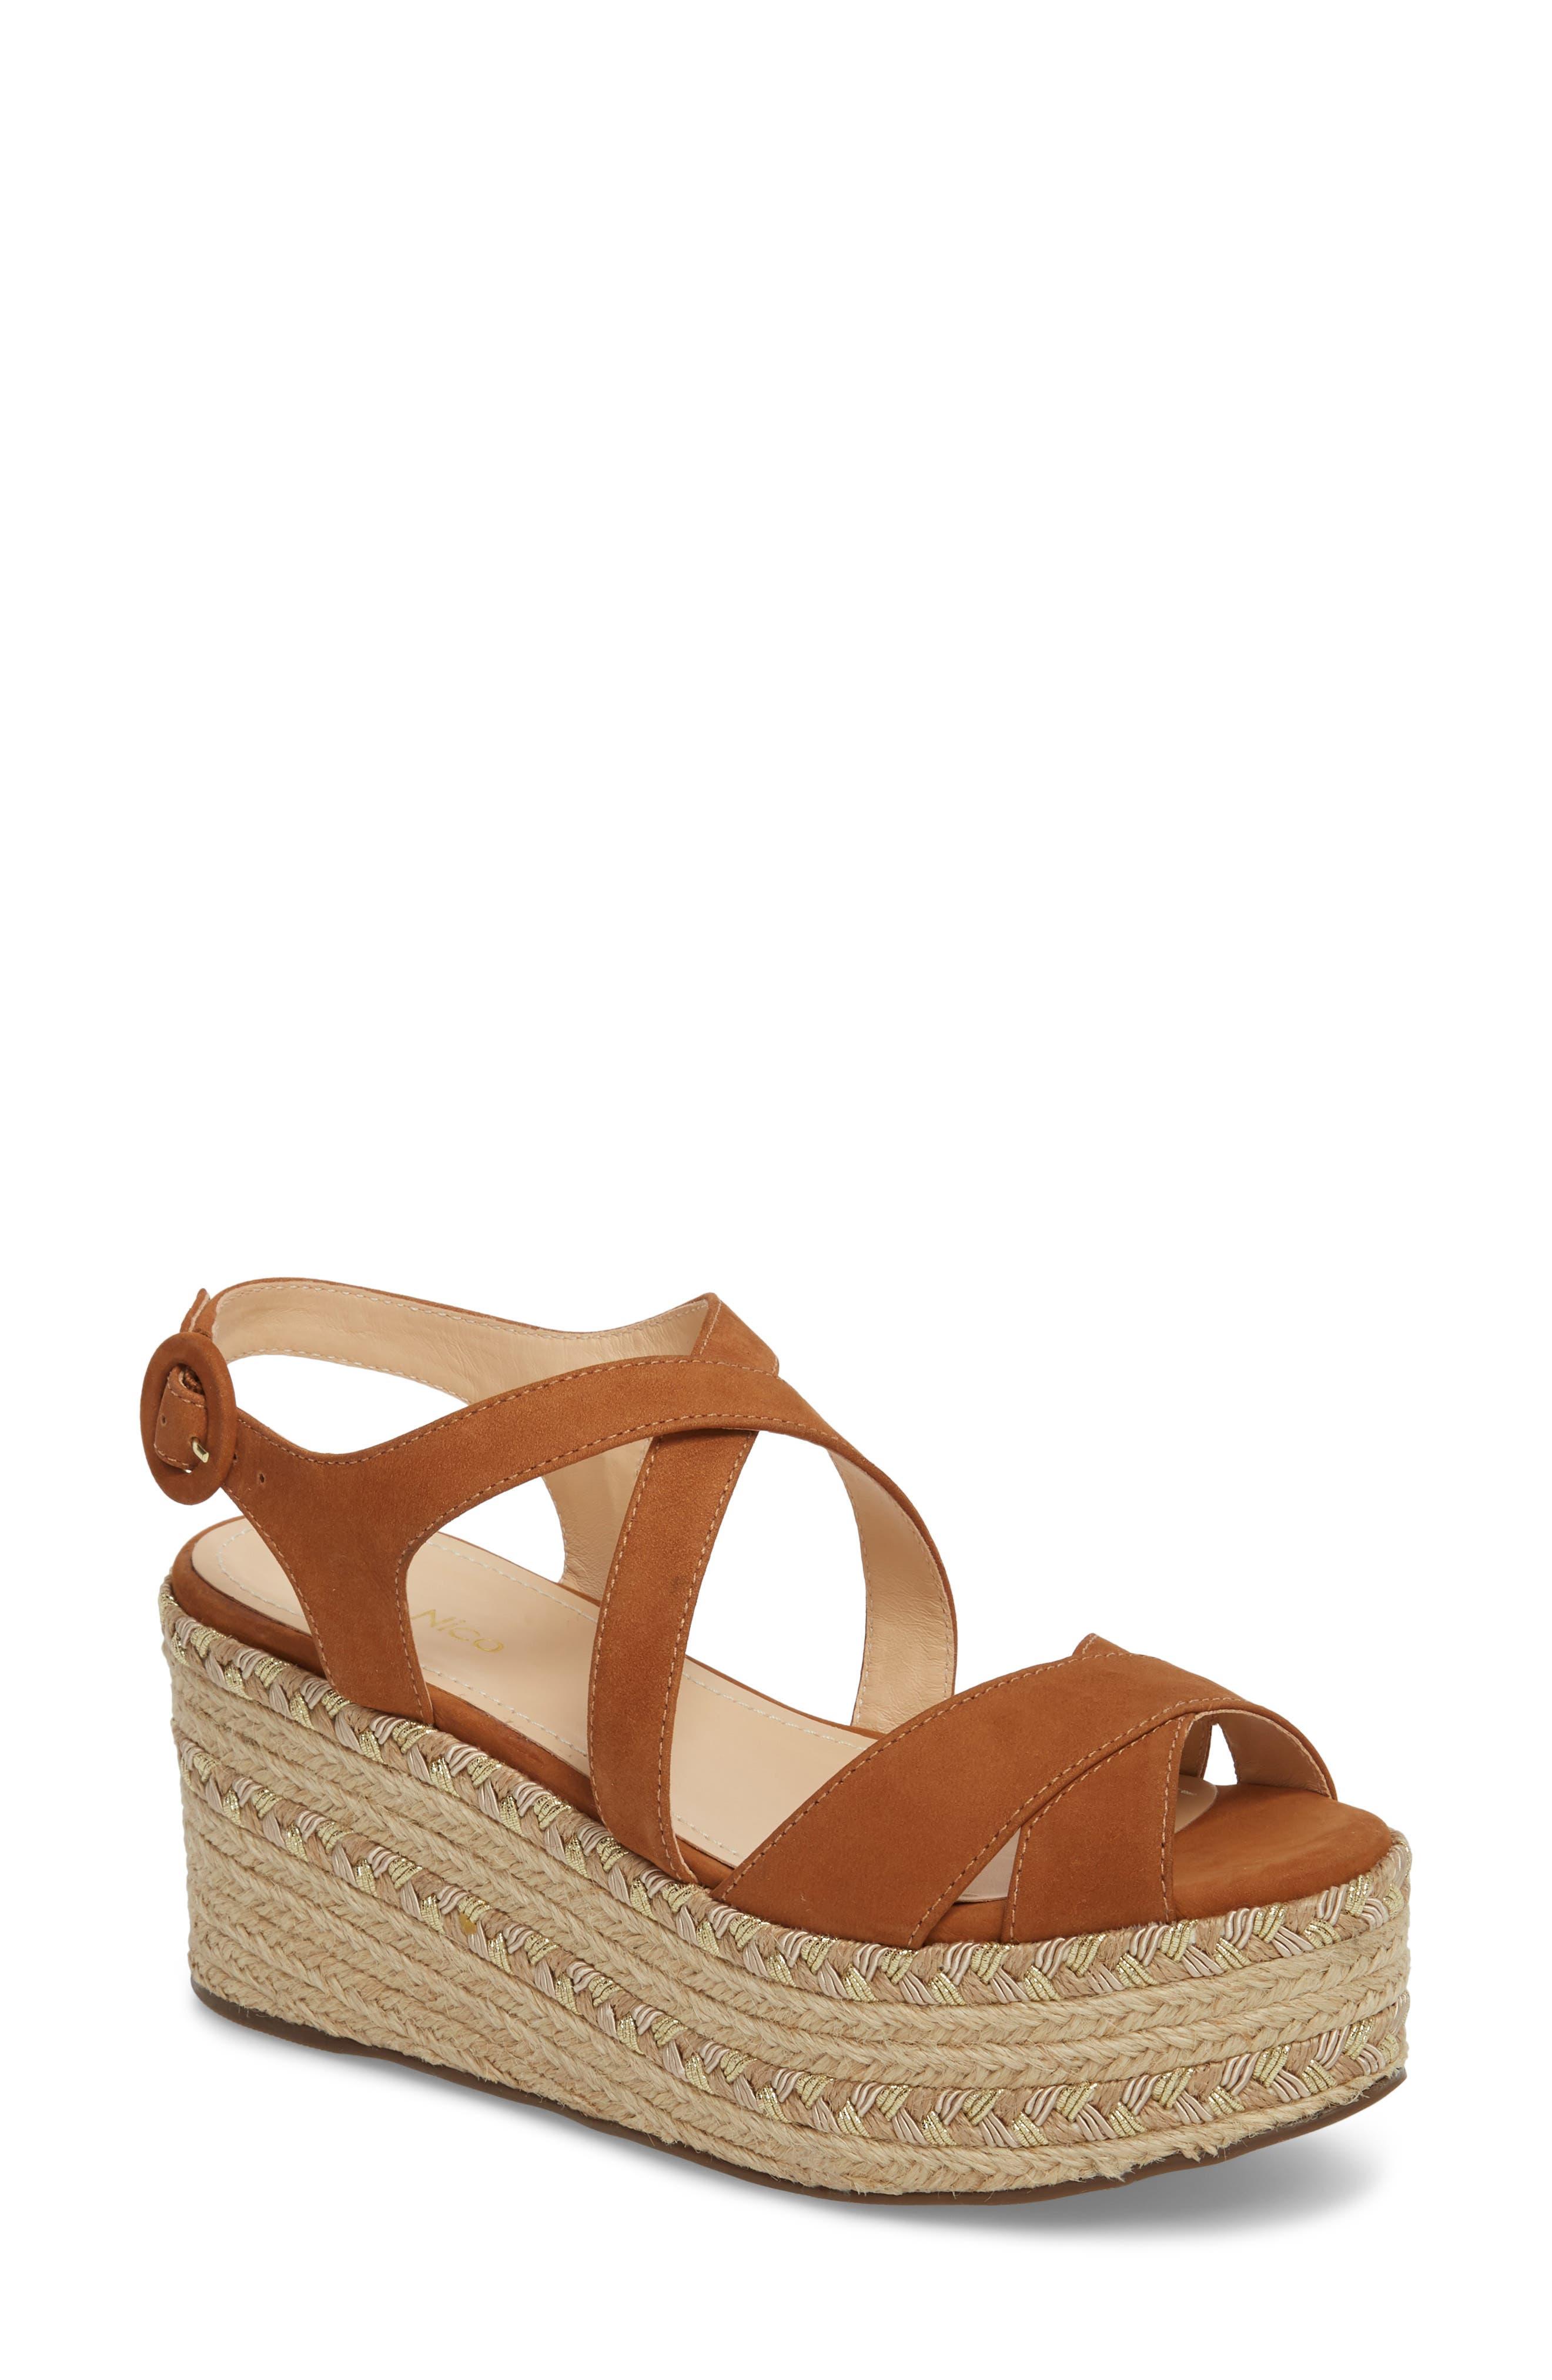 Vikki Espadrille Platform Sandal,                         Main,                         color, Tan Leather